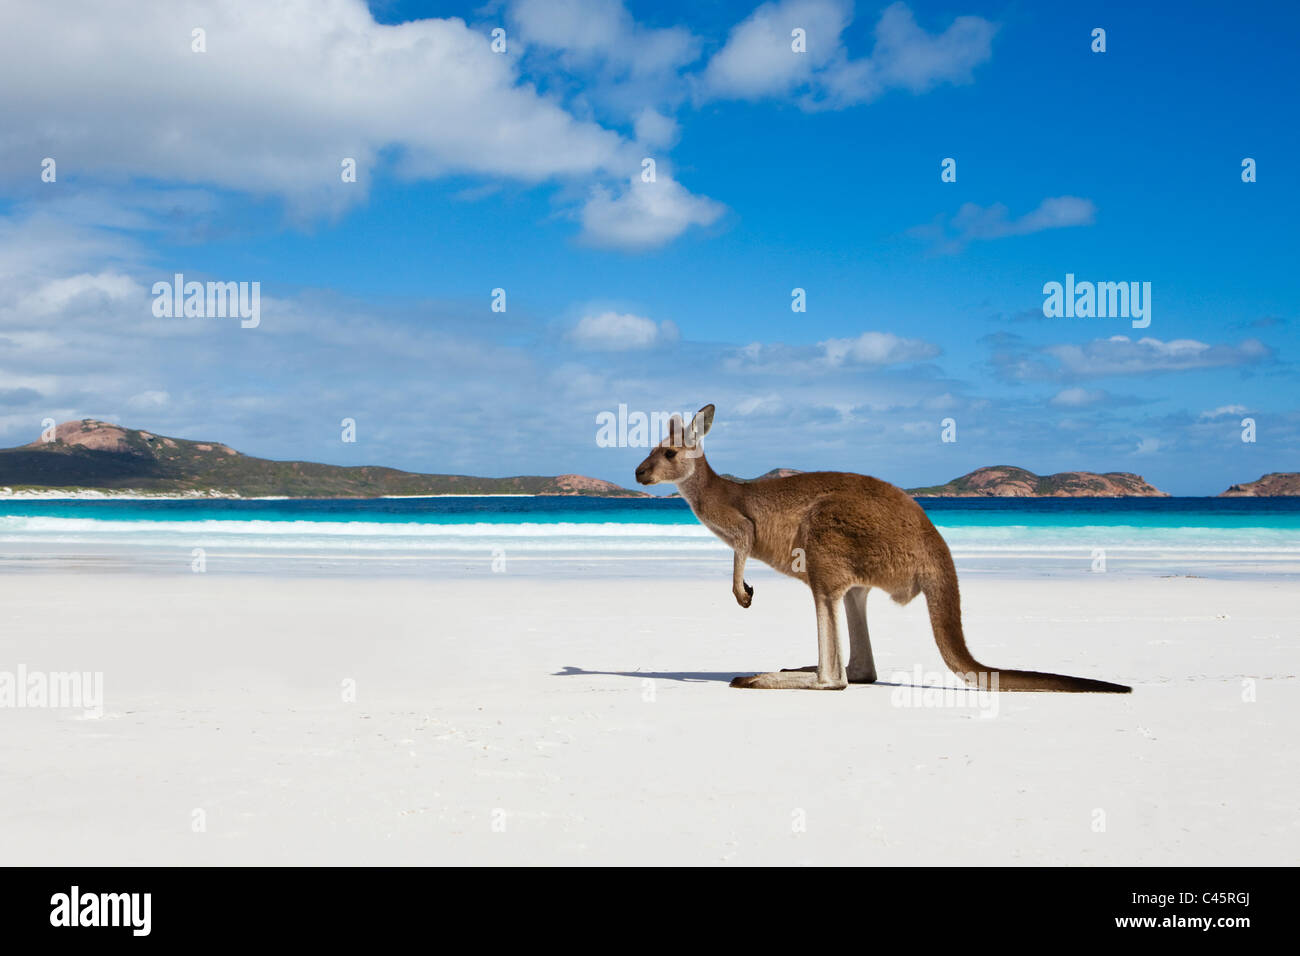 Kangaroo sulla spiaggia a Lucky Bay. Cape Le Grand National Park, Esperance, Australia occidentale, Australia Immagini Stock